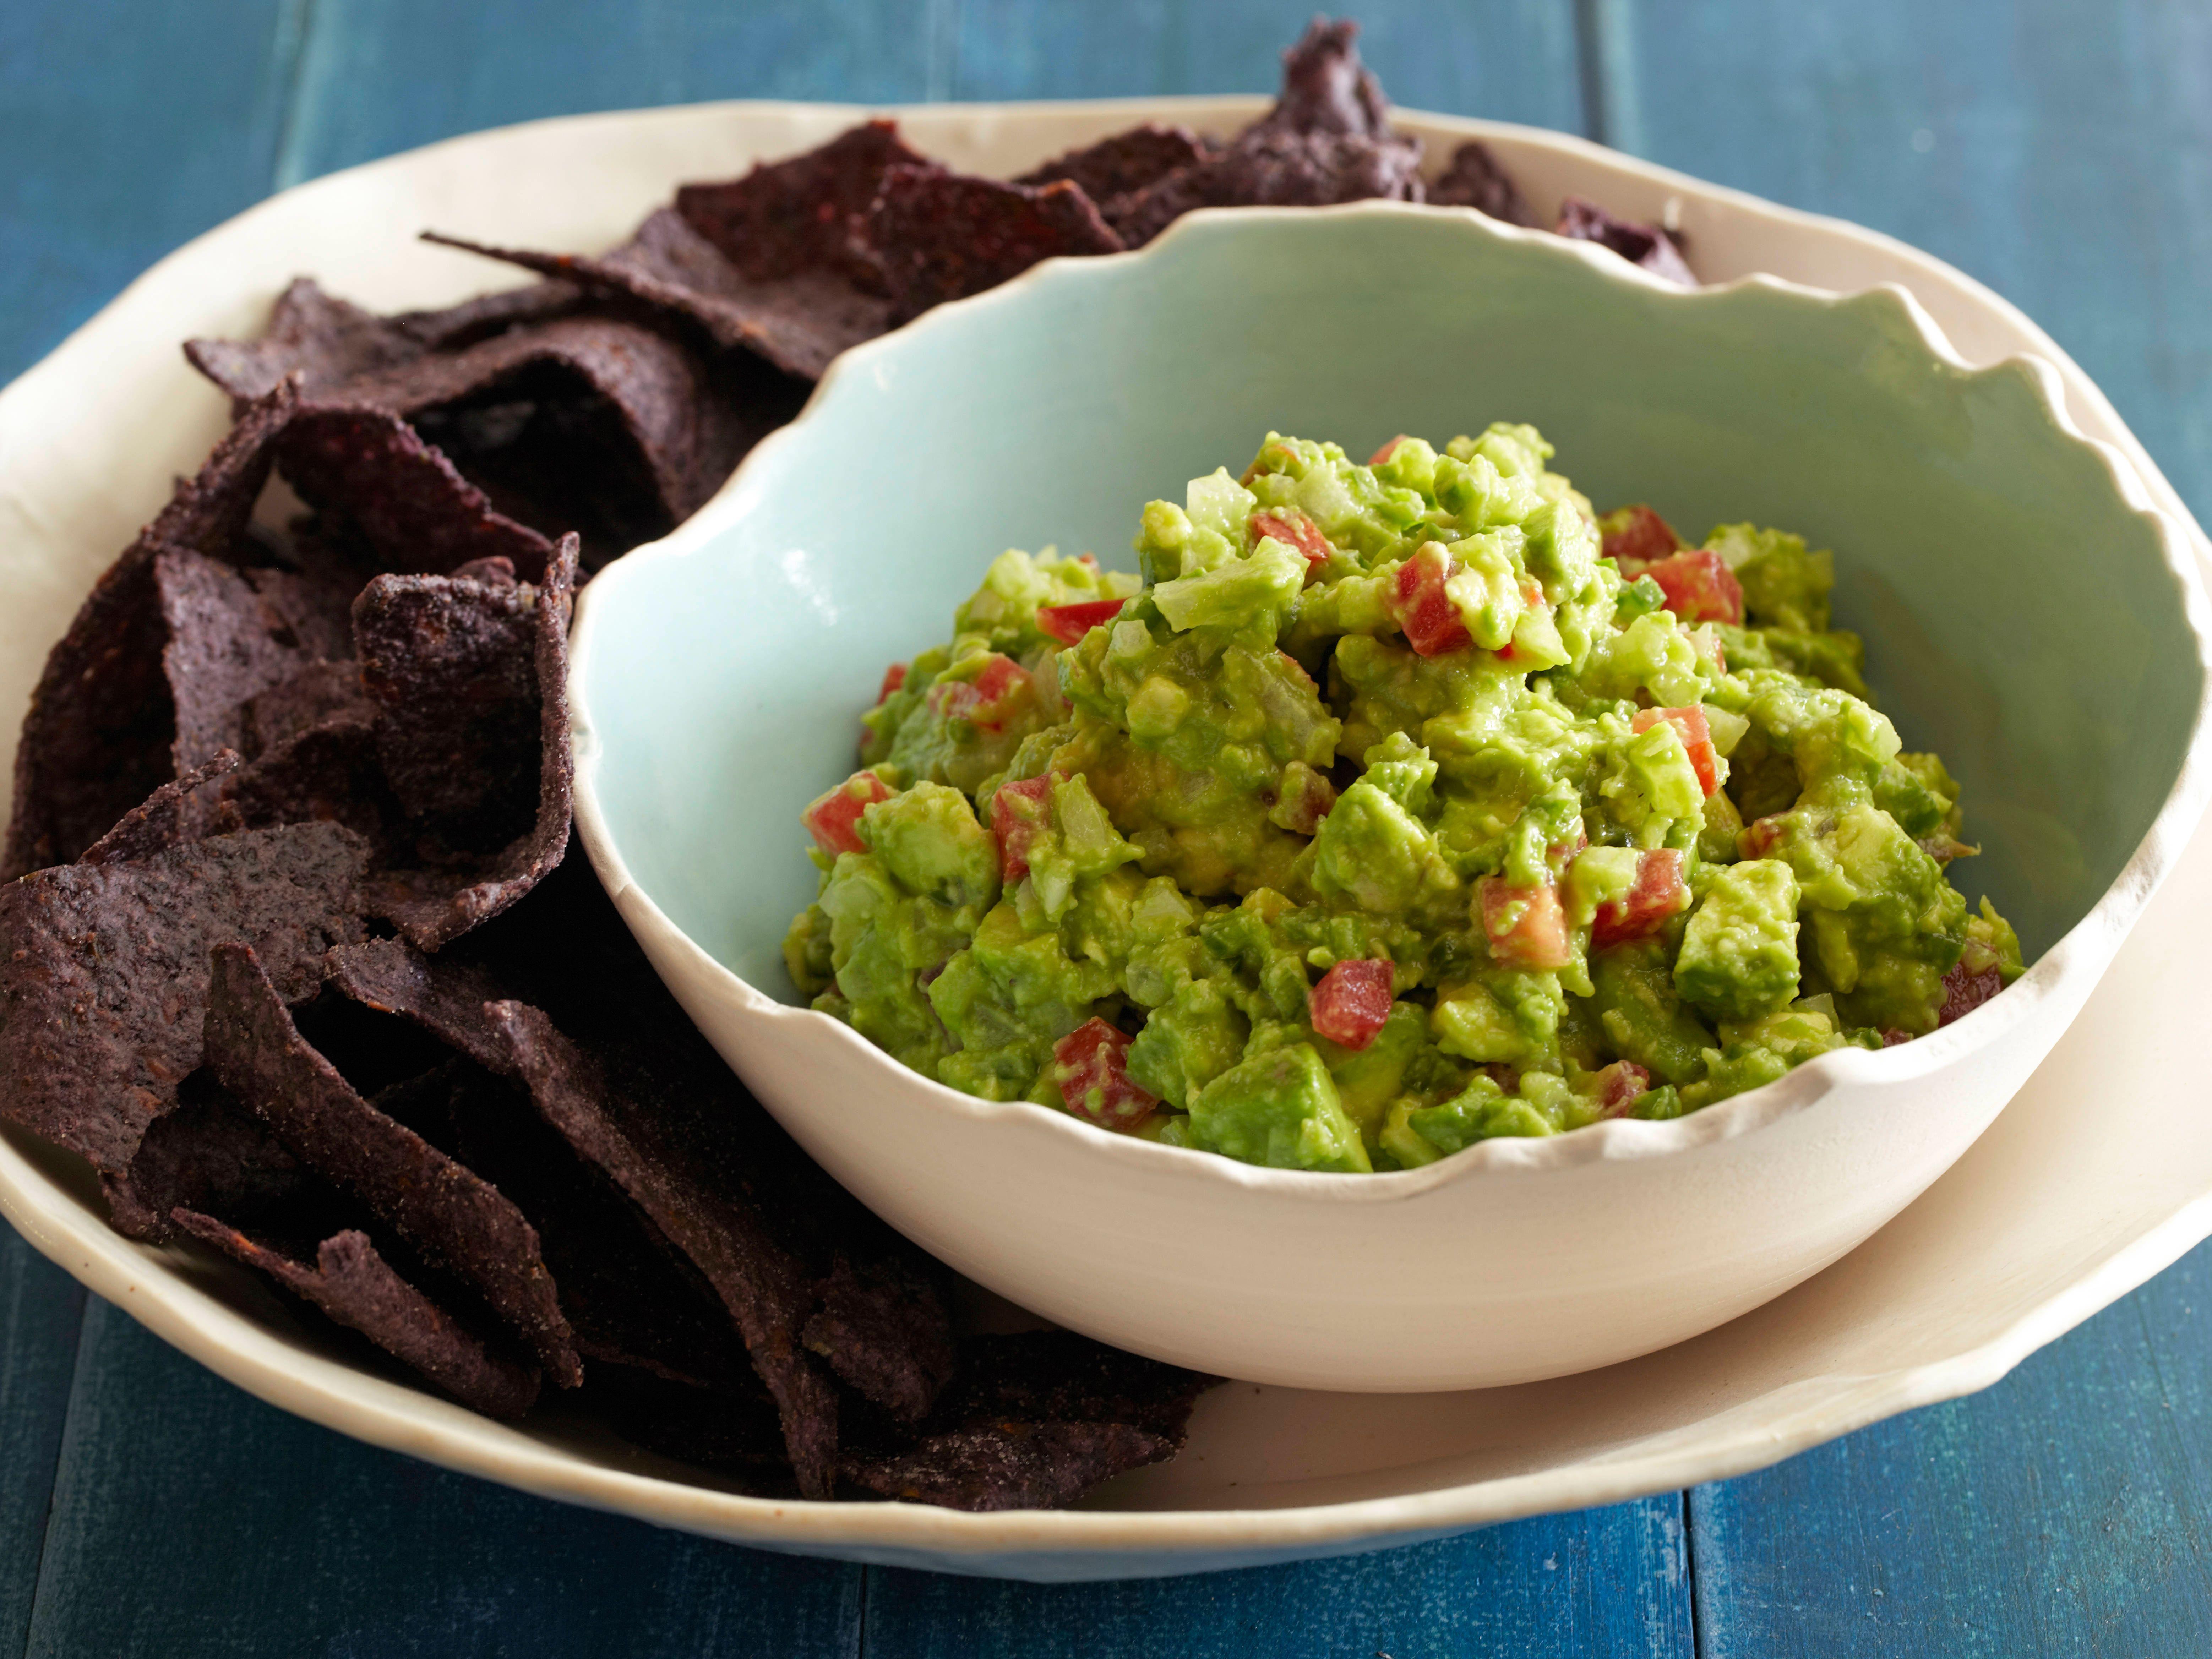 Garlicky holy guacamole recipe holy guacamole guacamole recipe garlicky holy guacamole recipe holy guacamole guacamole recipe and recipes forumfinder Gallery